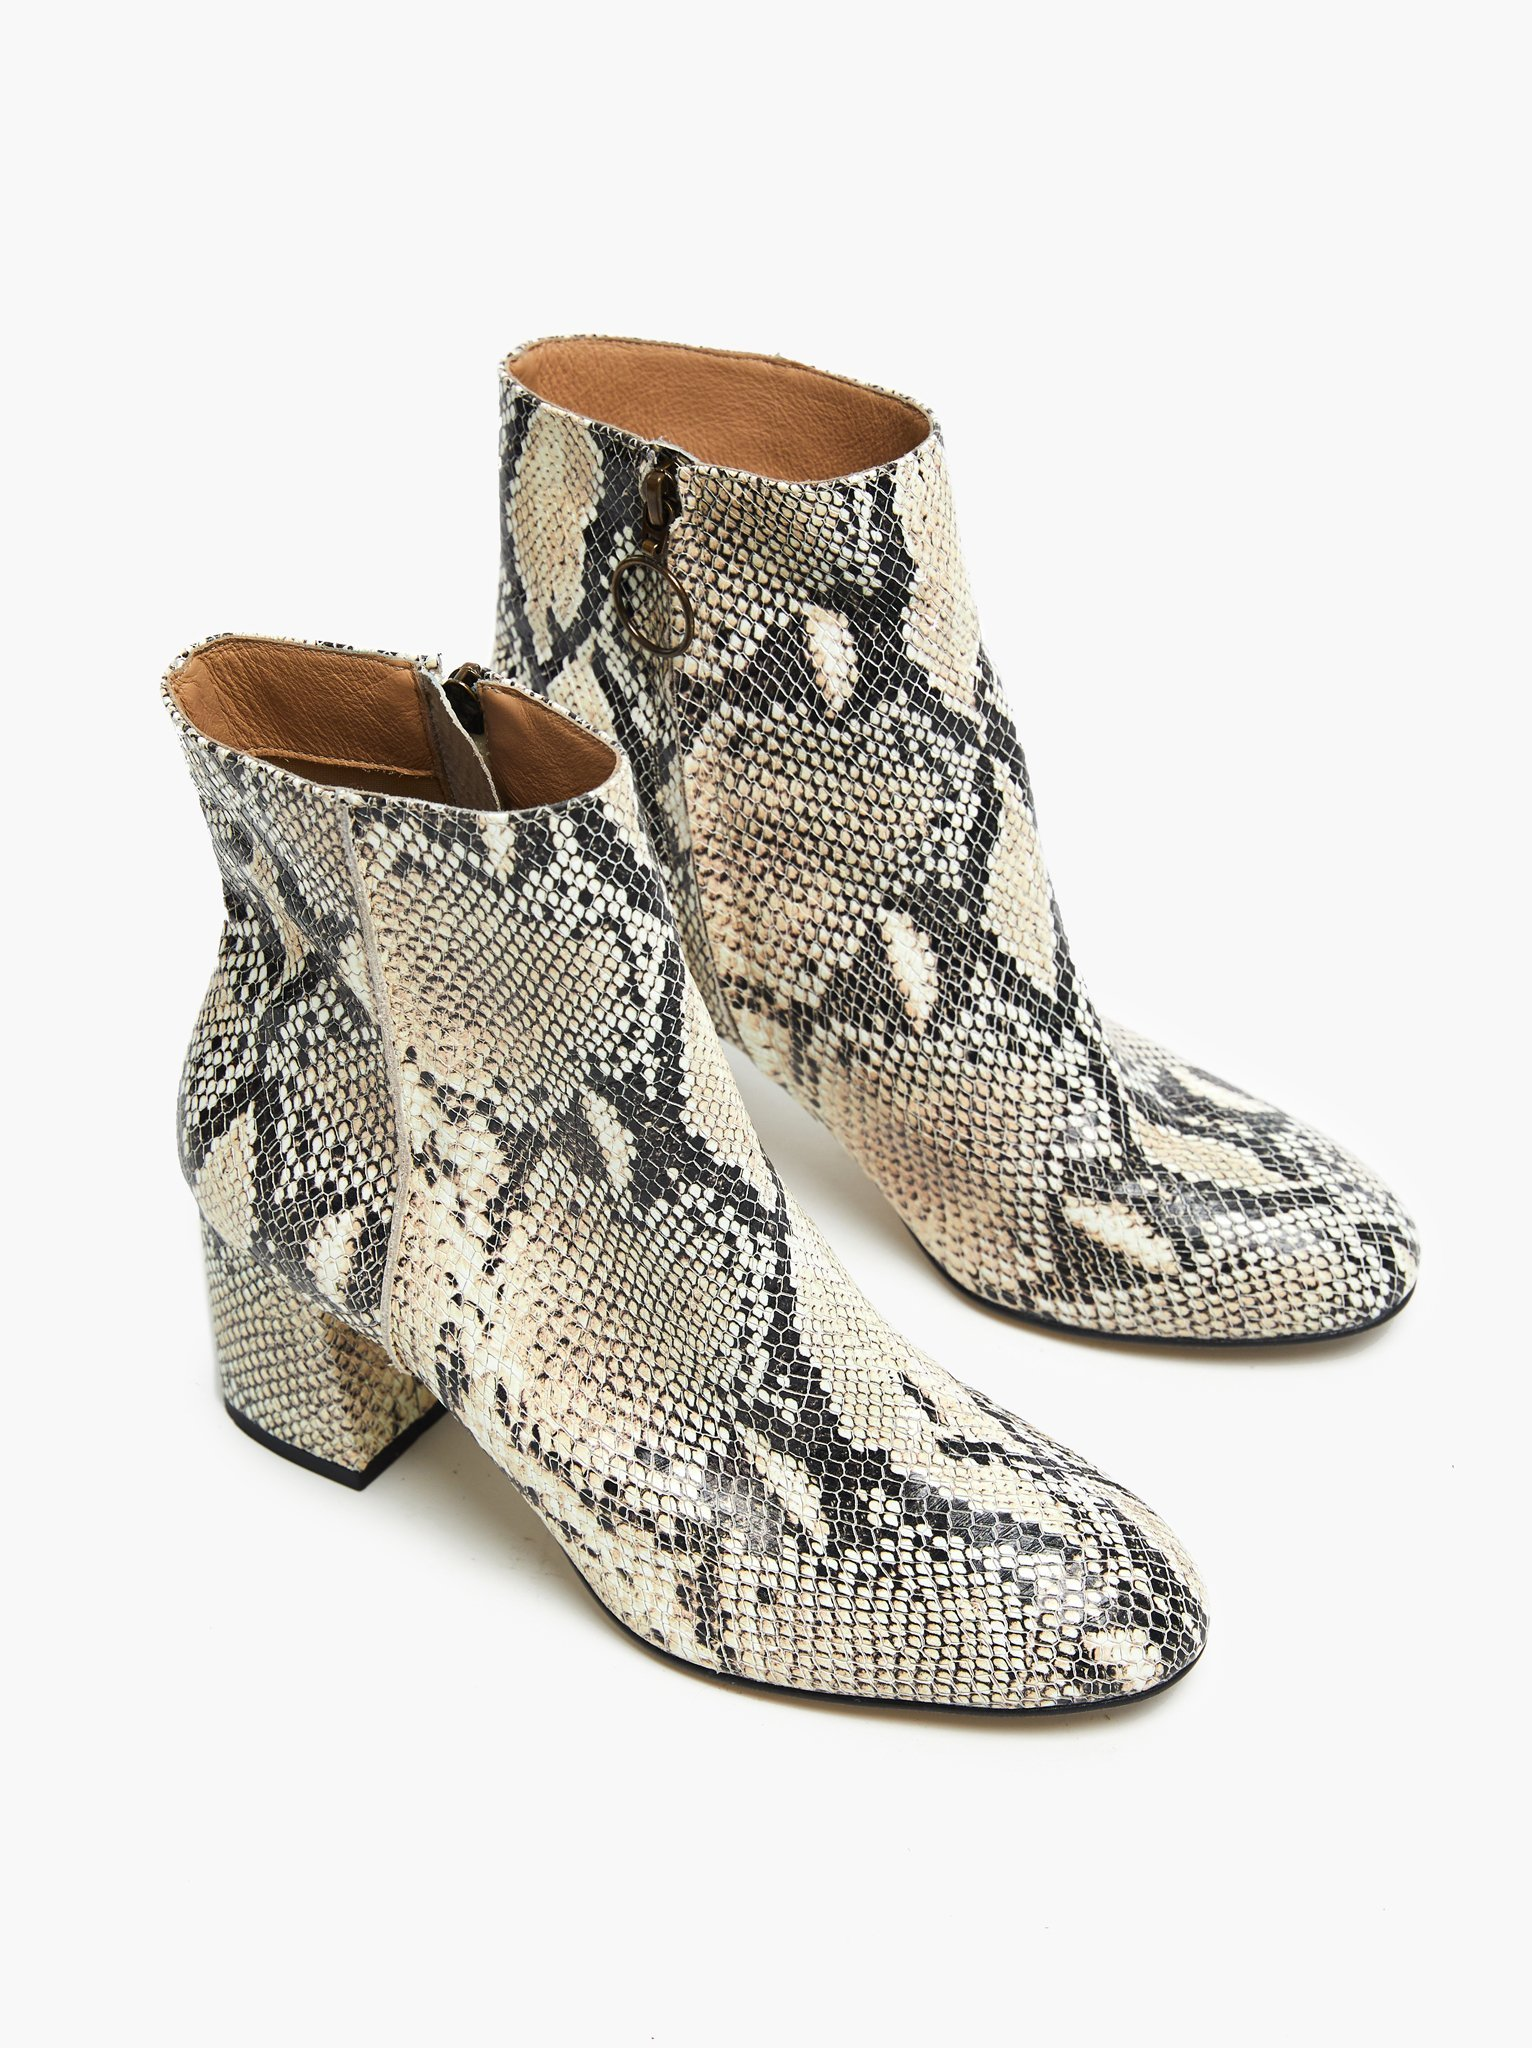 Fashionable Celina Boot